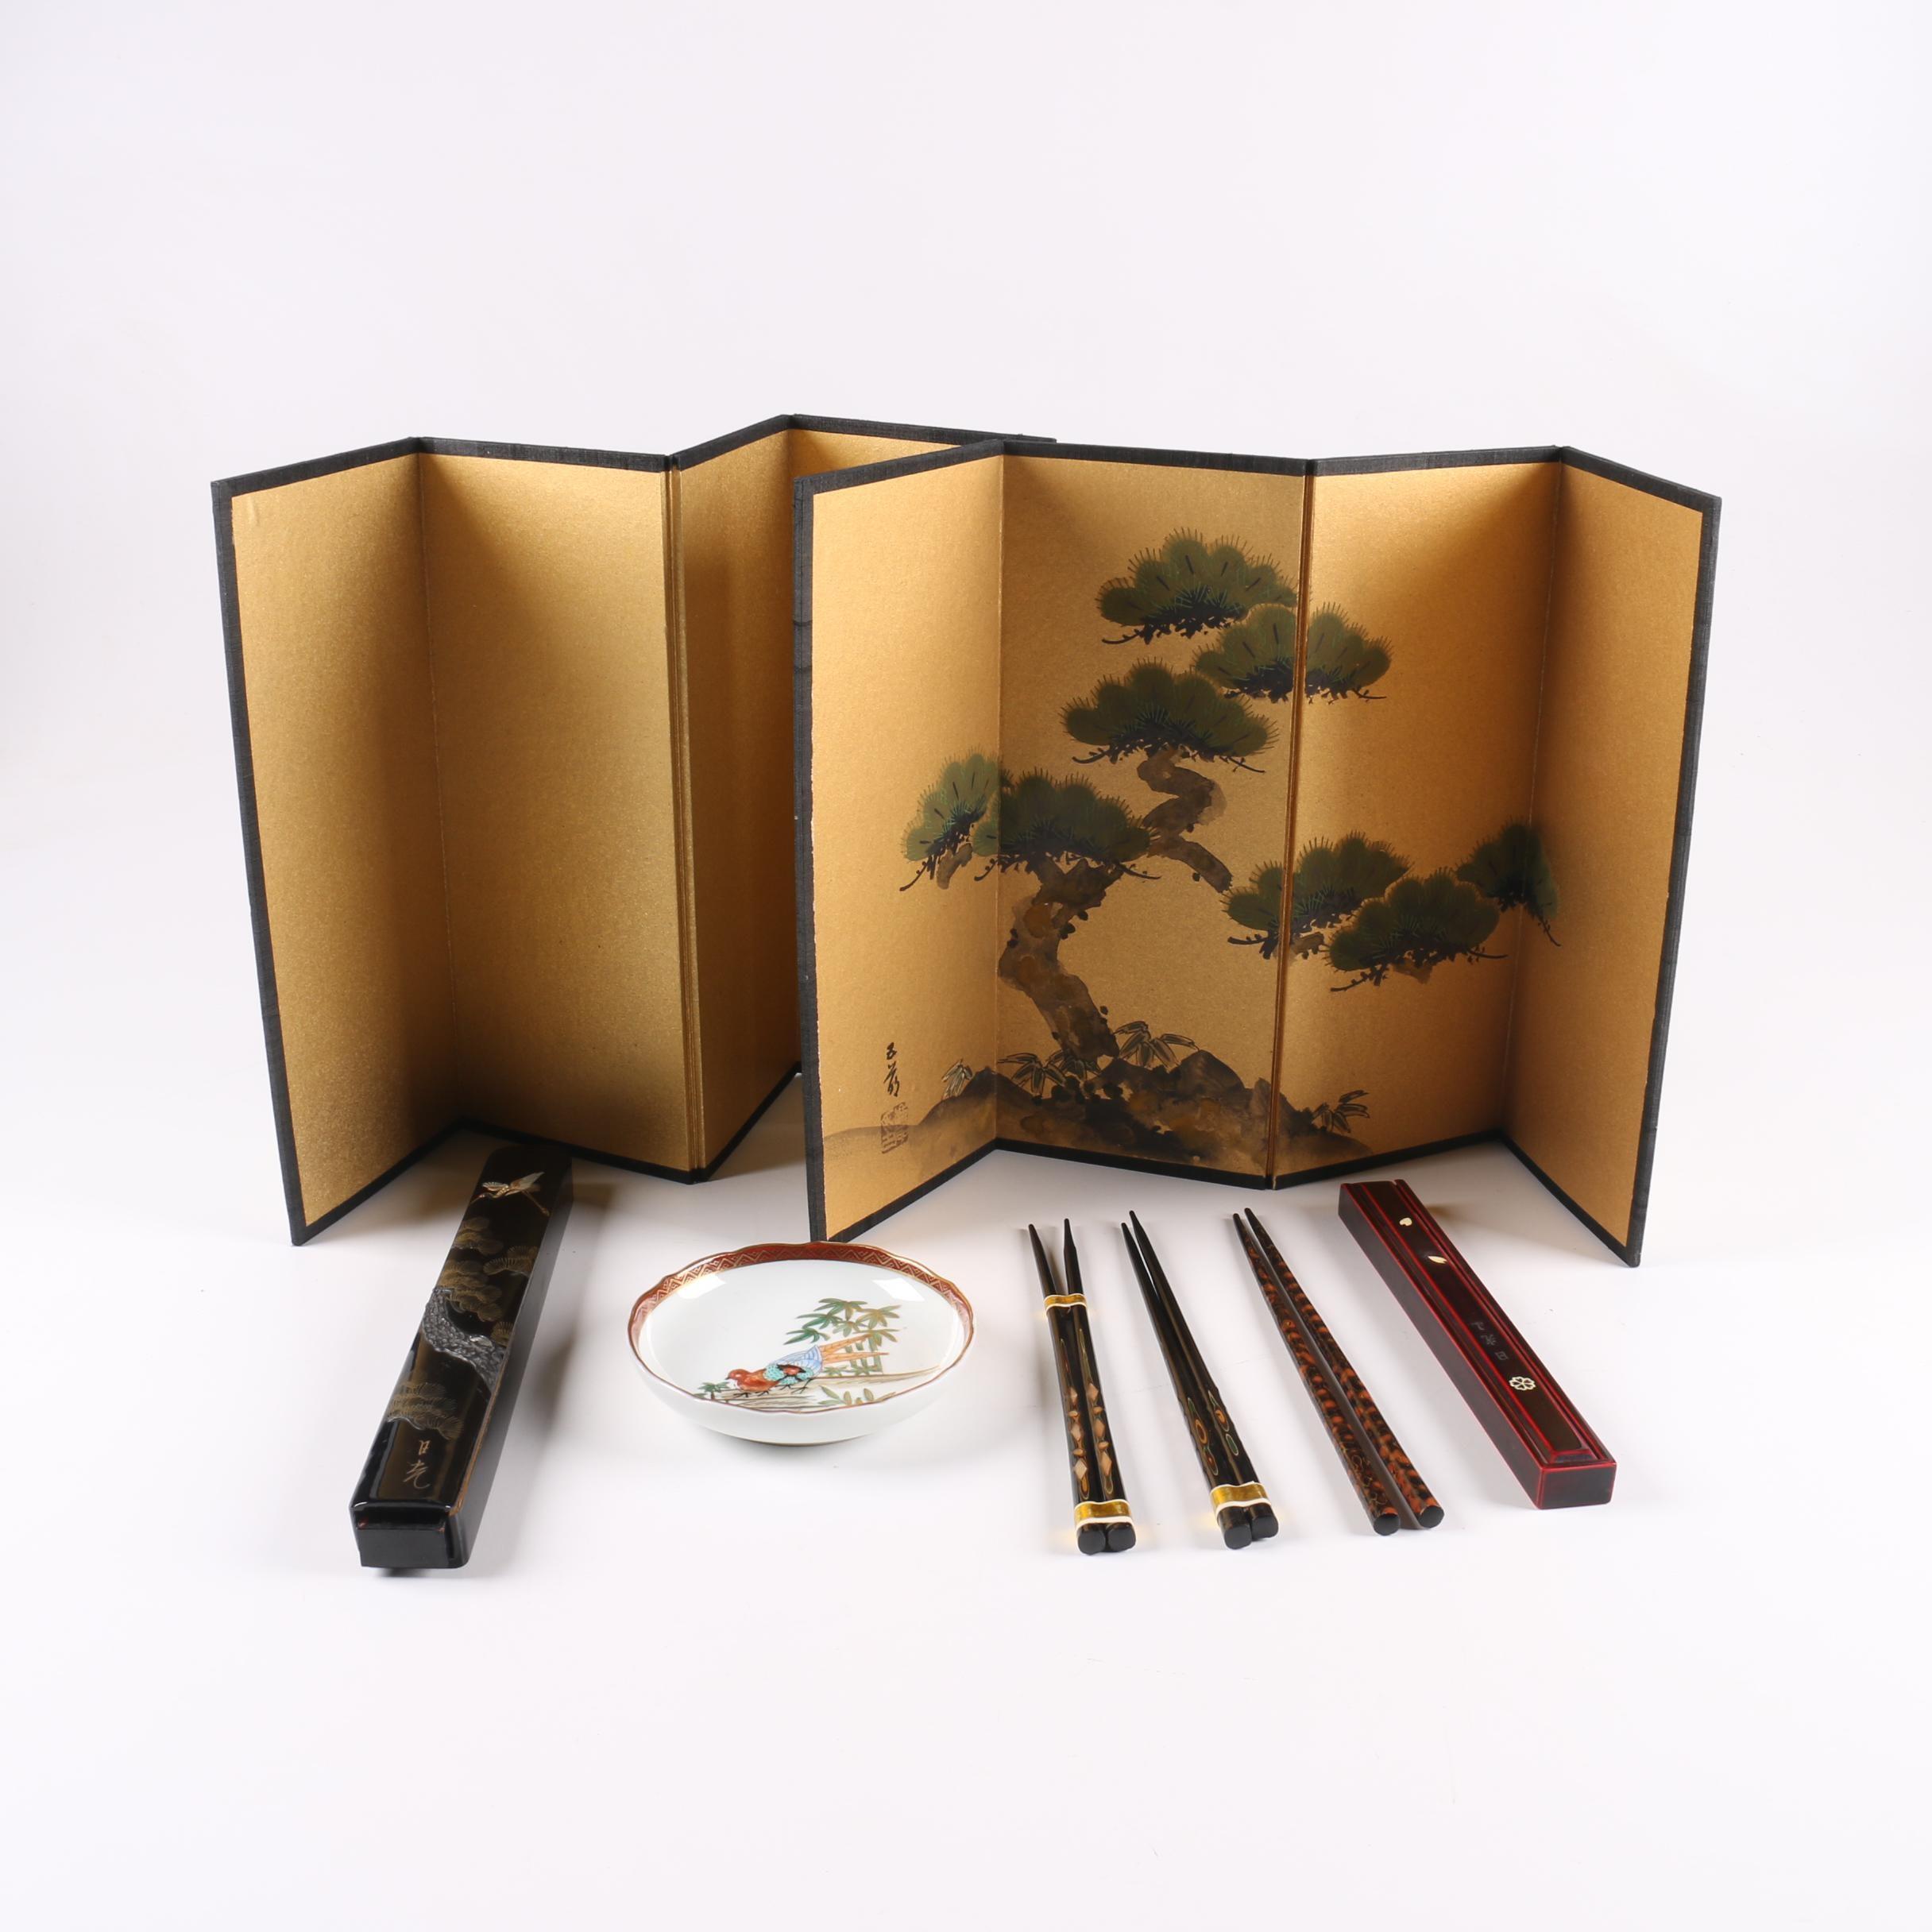 Japanese Table Screens, Chopsticks, and Trinket Dish